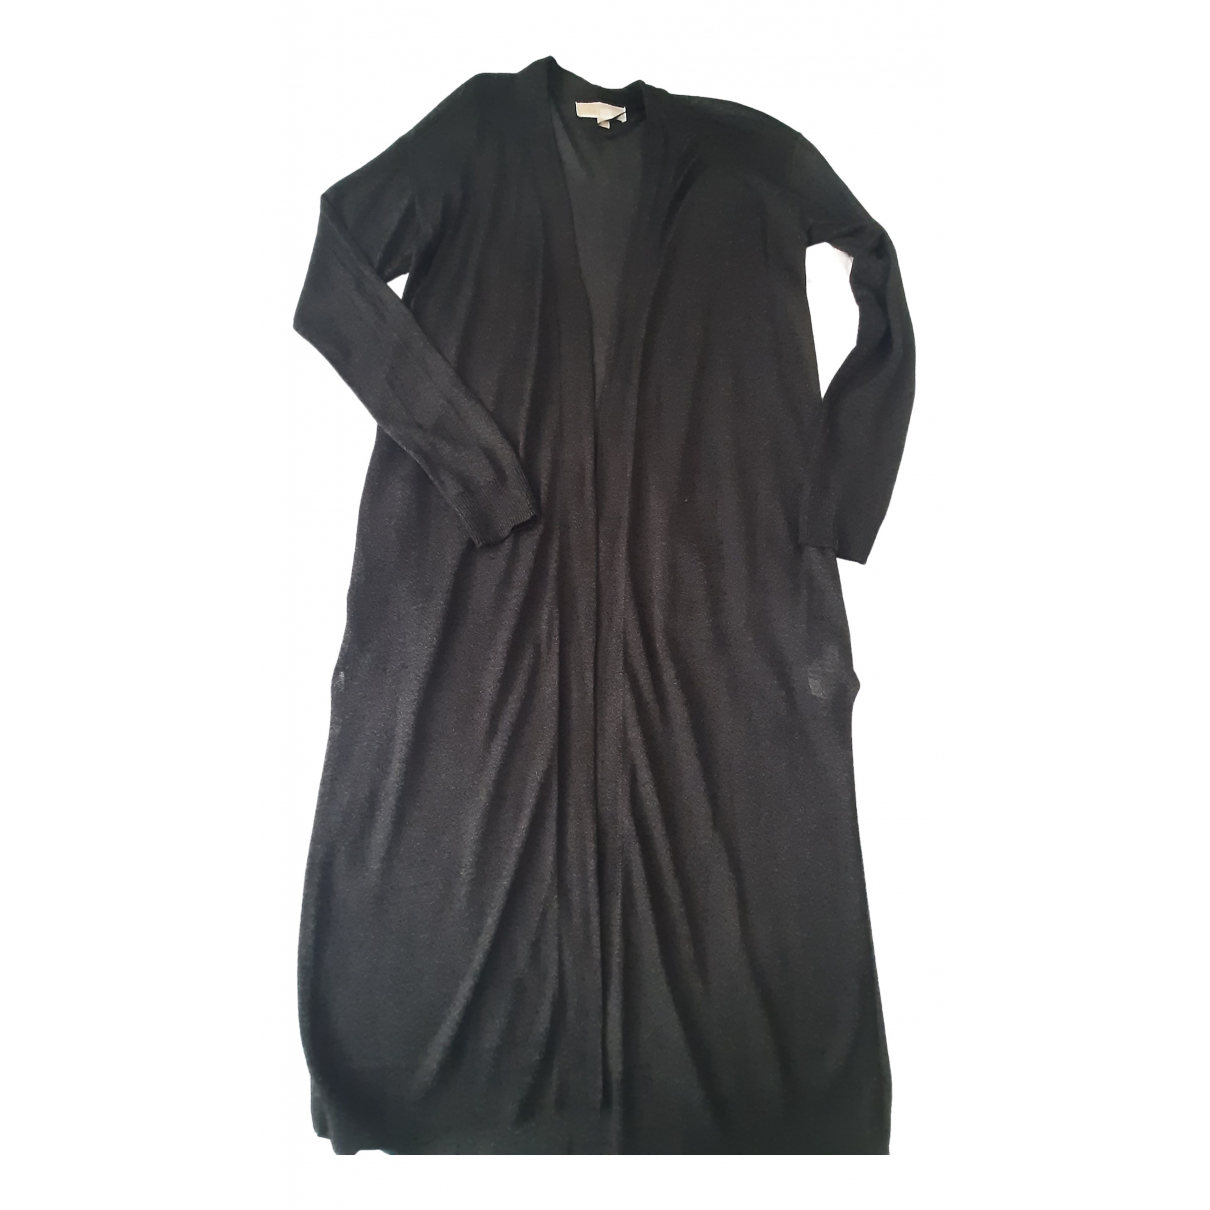 Michael Kors \N Anthracite Knitwear for Women S International